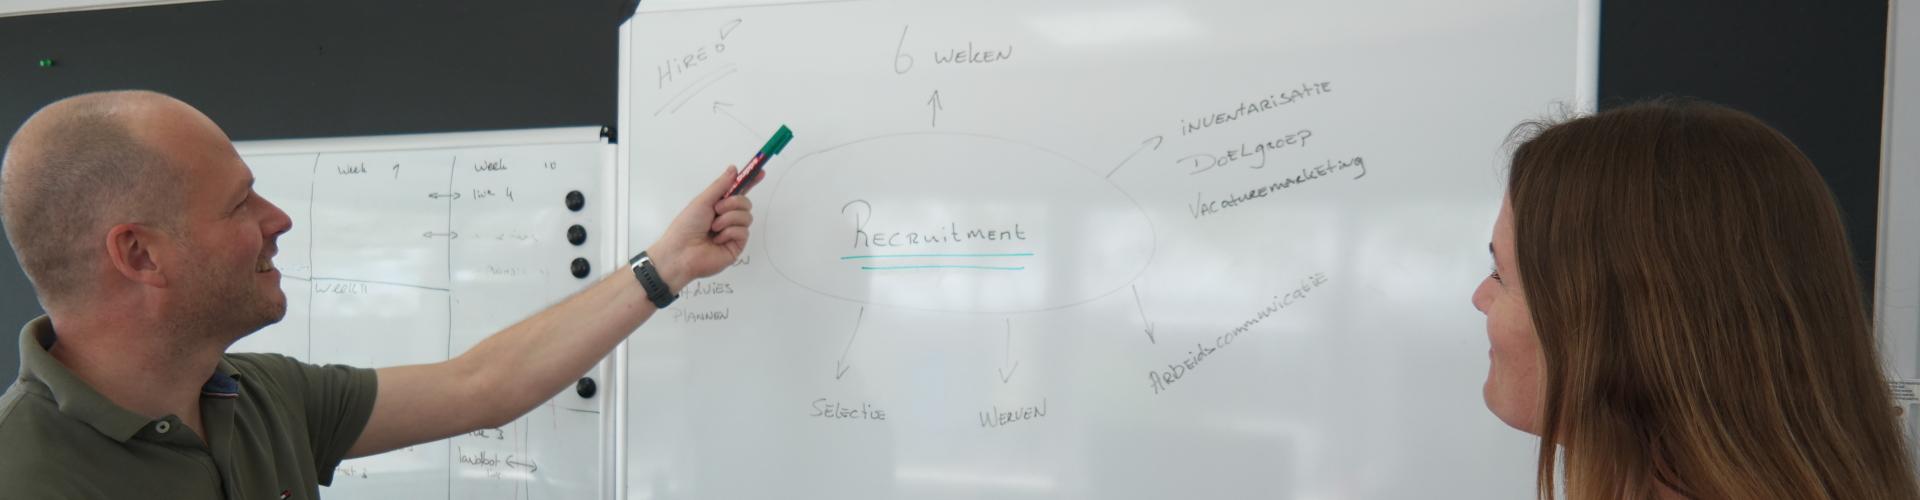 iRecruit recruitment breda